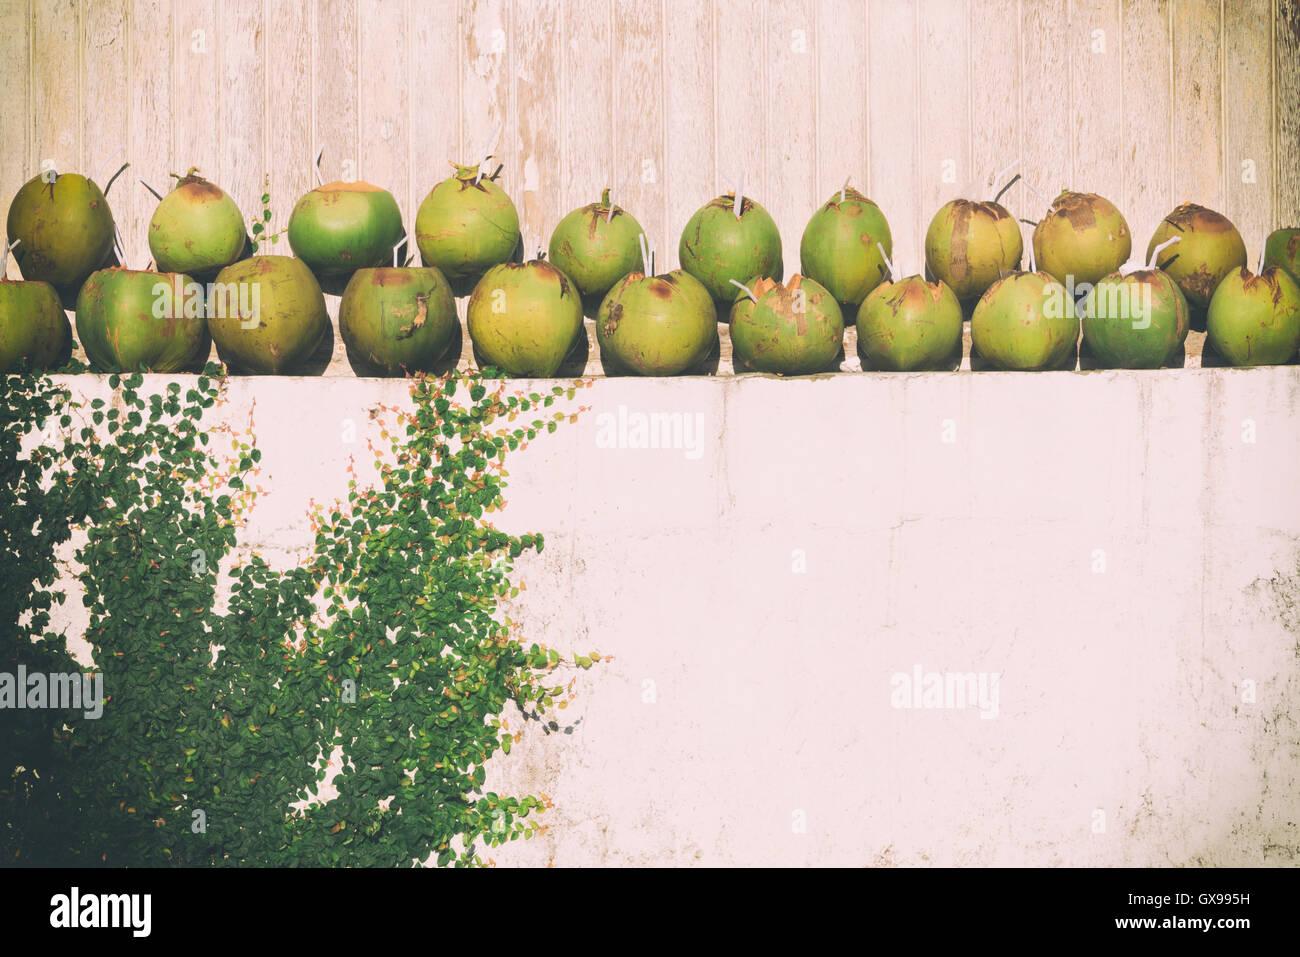 drink coconut water stockfotos drink coconut water bilder alamy. Black Bedroom Furniture Sets. Home Design Ideas